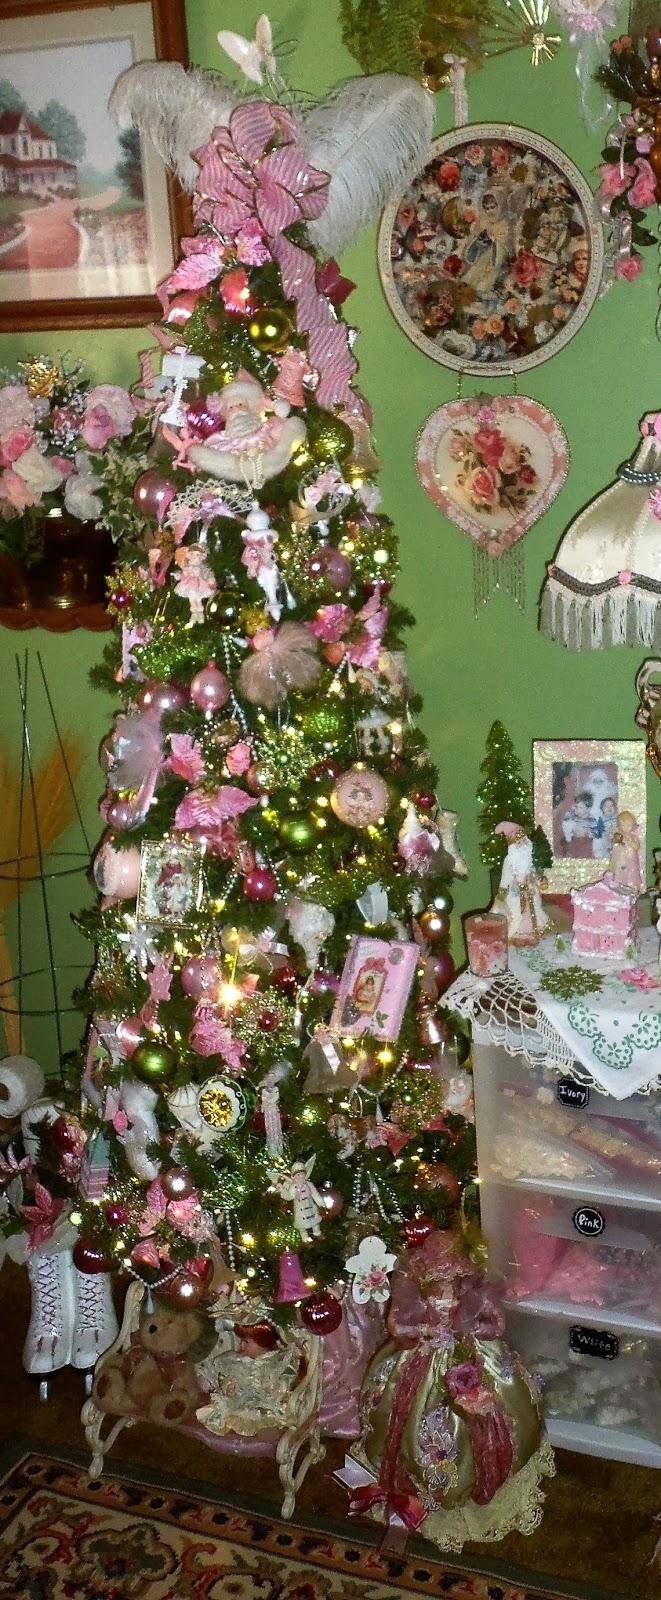 A DEBBIE-DABBLE CHRISTMAS: Craft Room Tree, Christmas Home Tour 2016